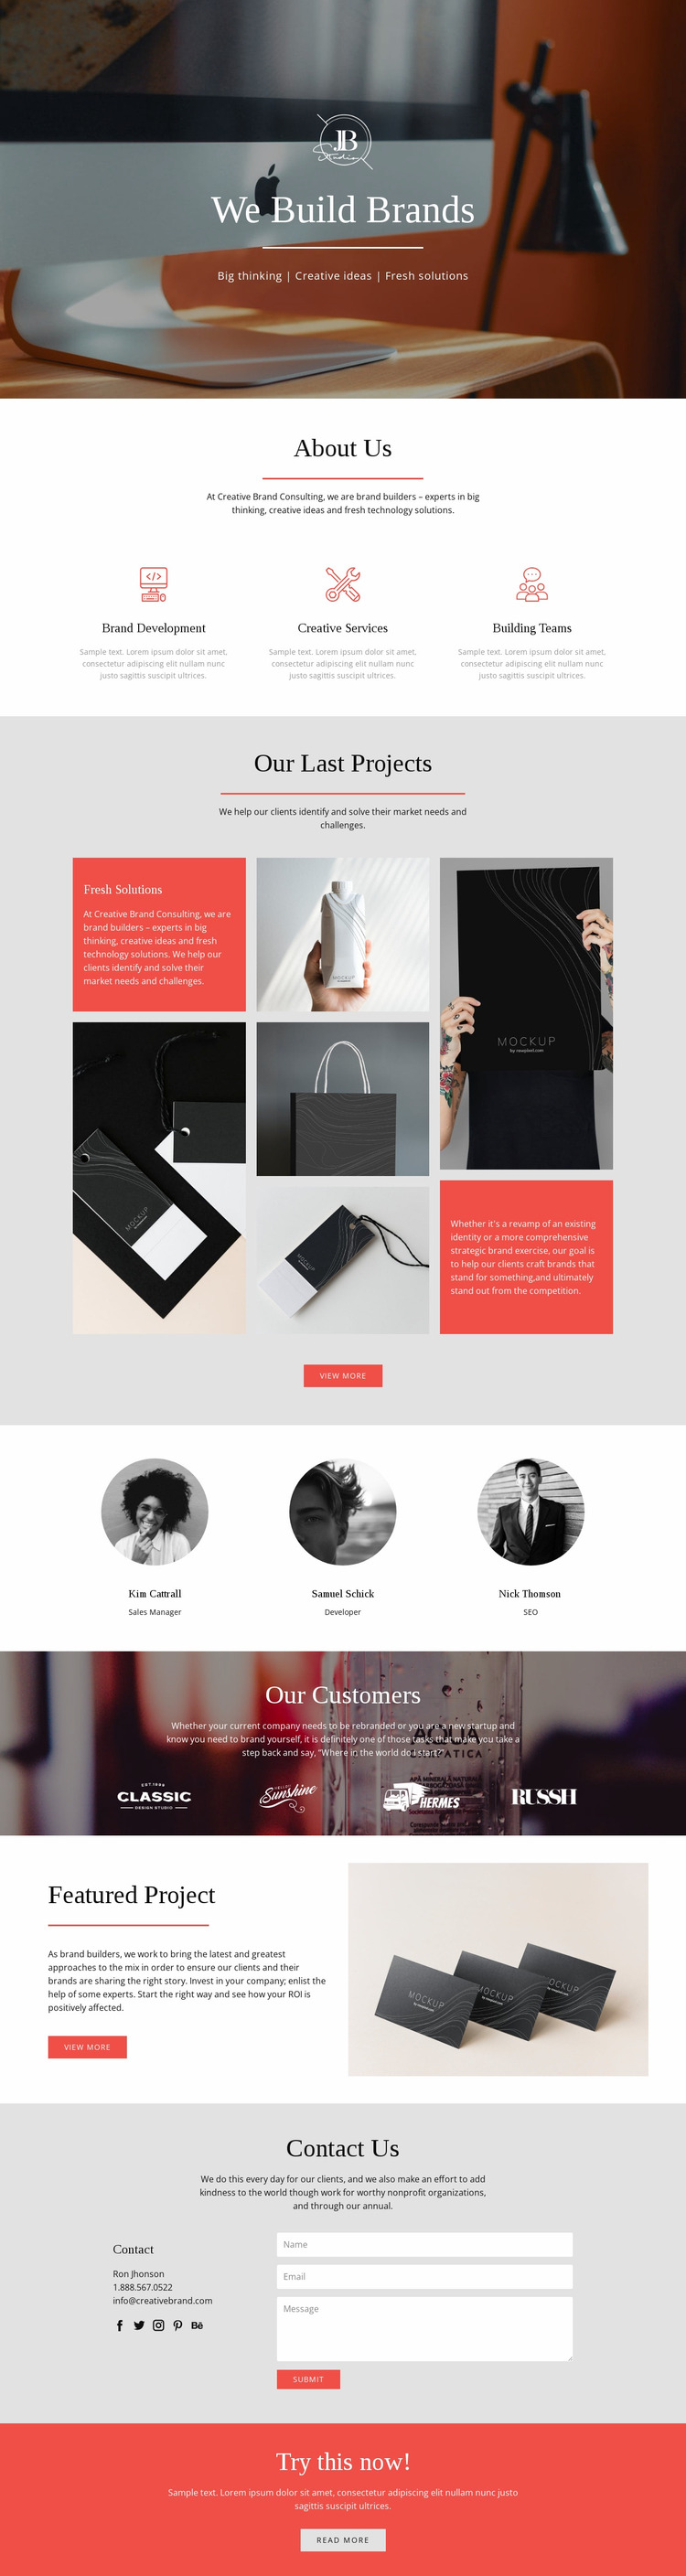 We build brands Website Mockup